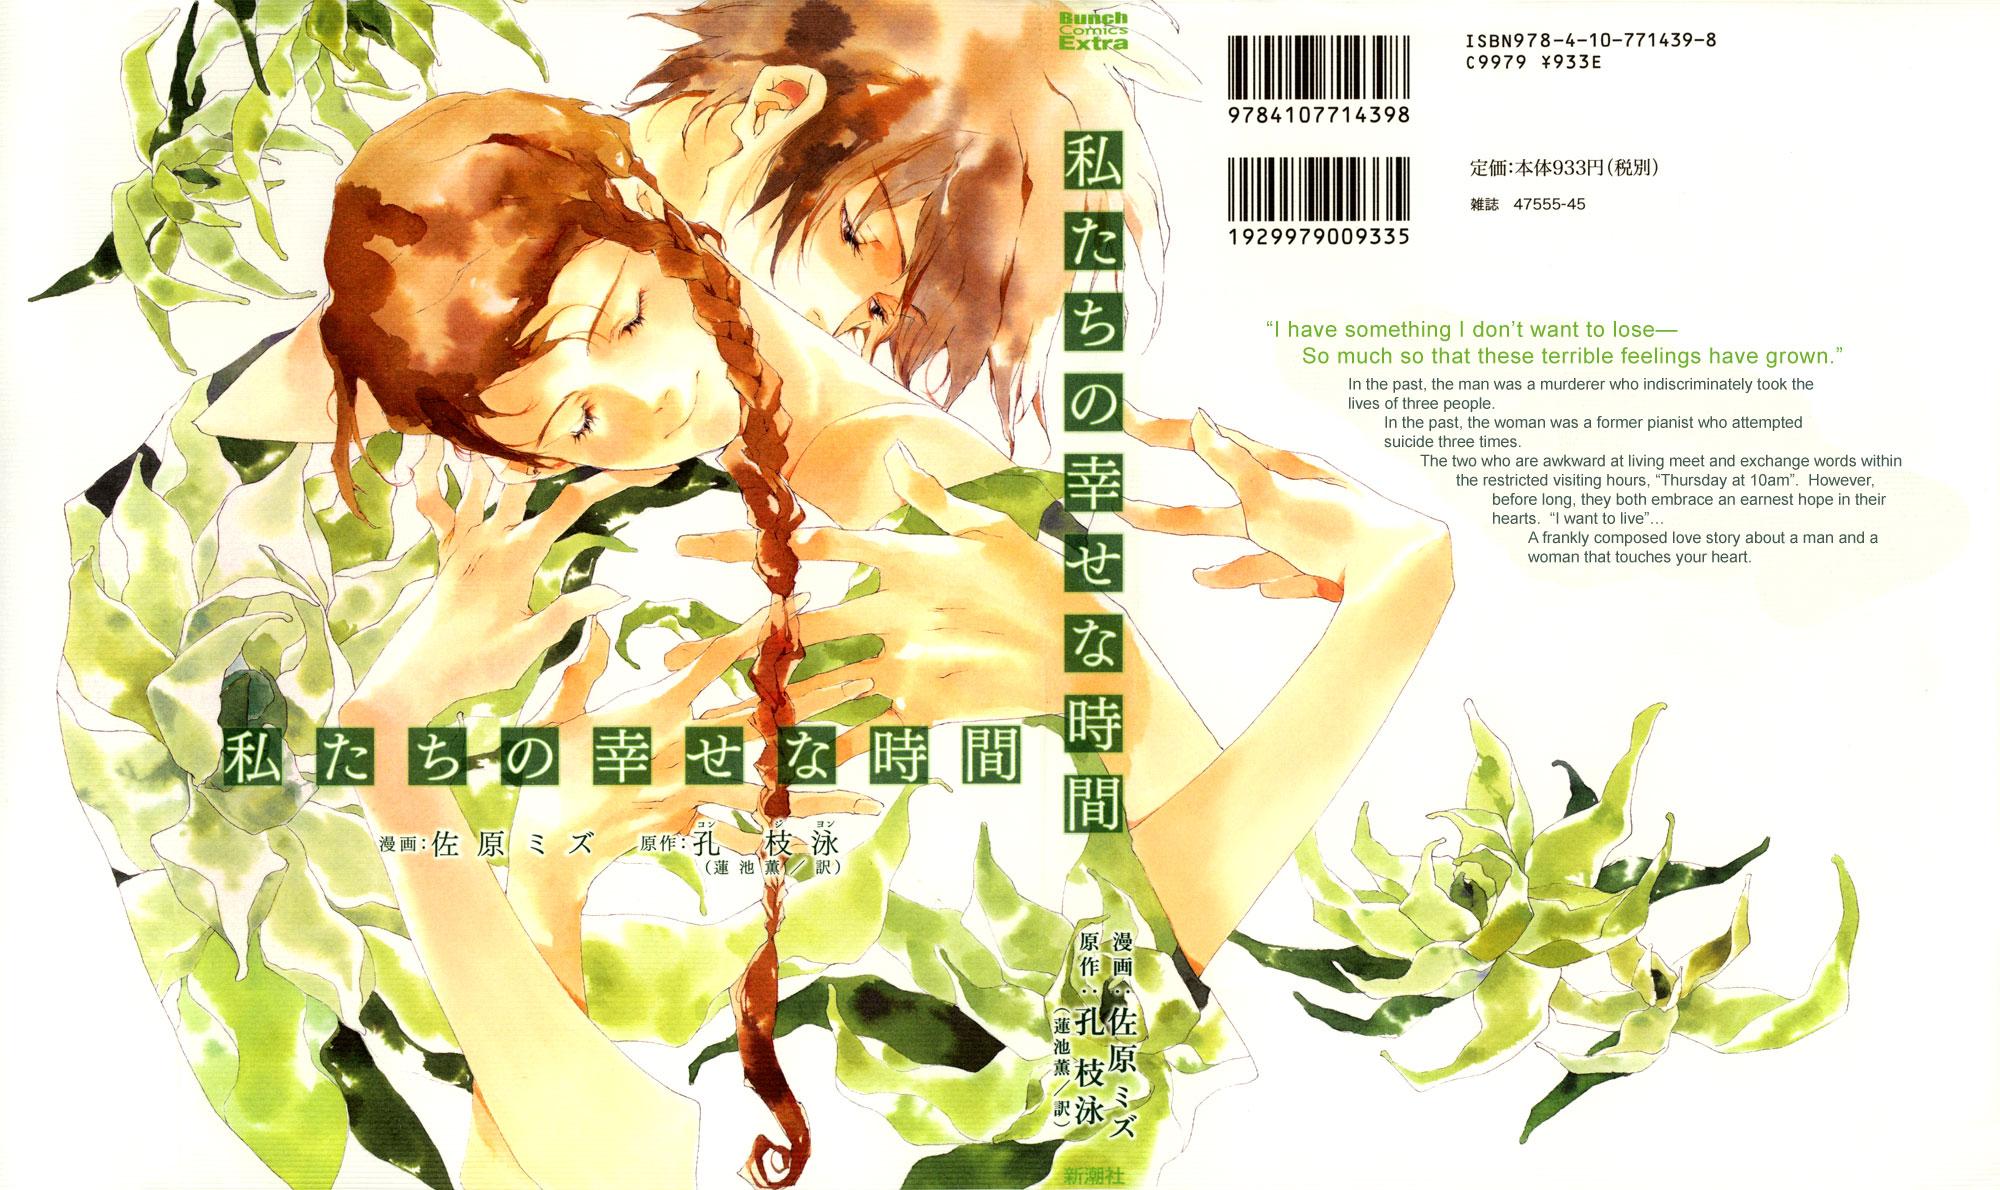 Crispy's anime/manga log [Archive] - Page 3 - The Millennium